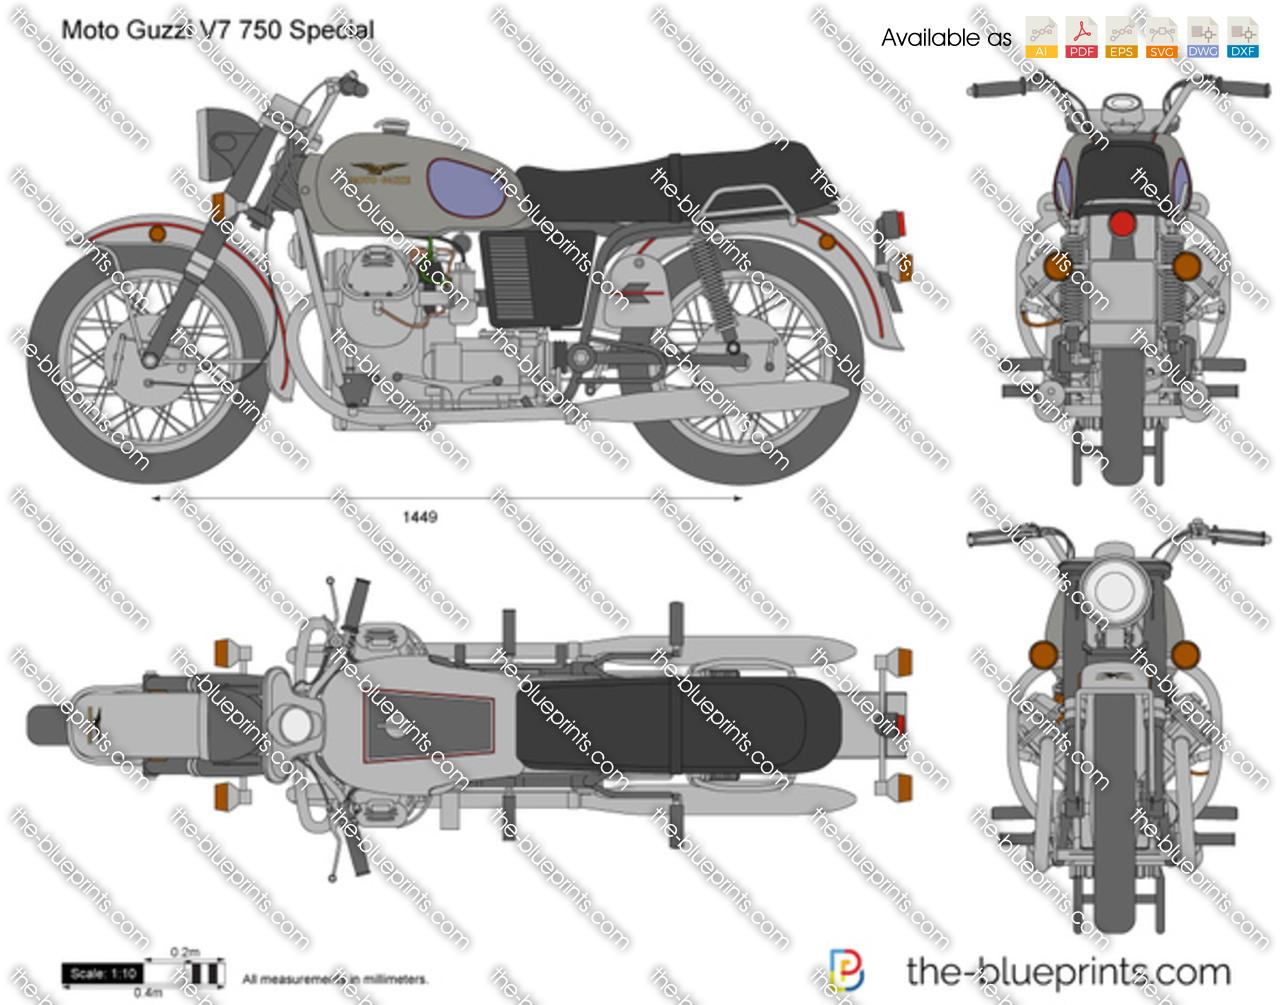 Moto Guzzi V7 750 Special 1972